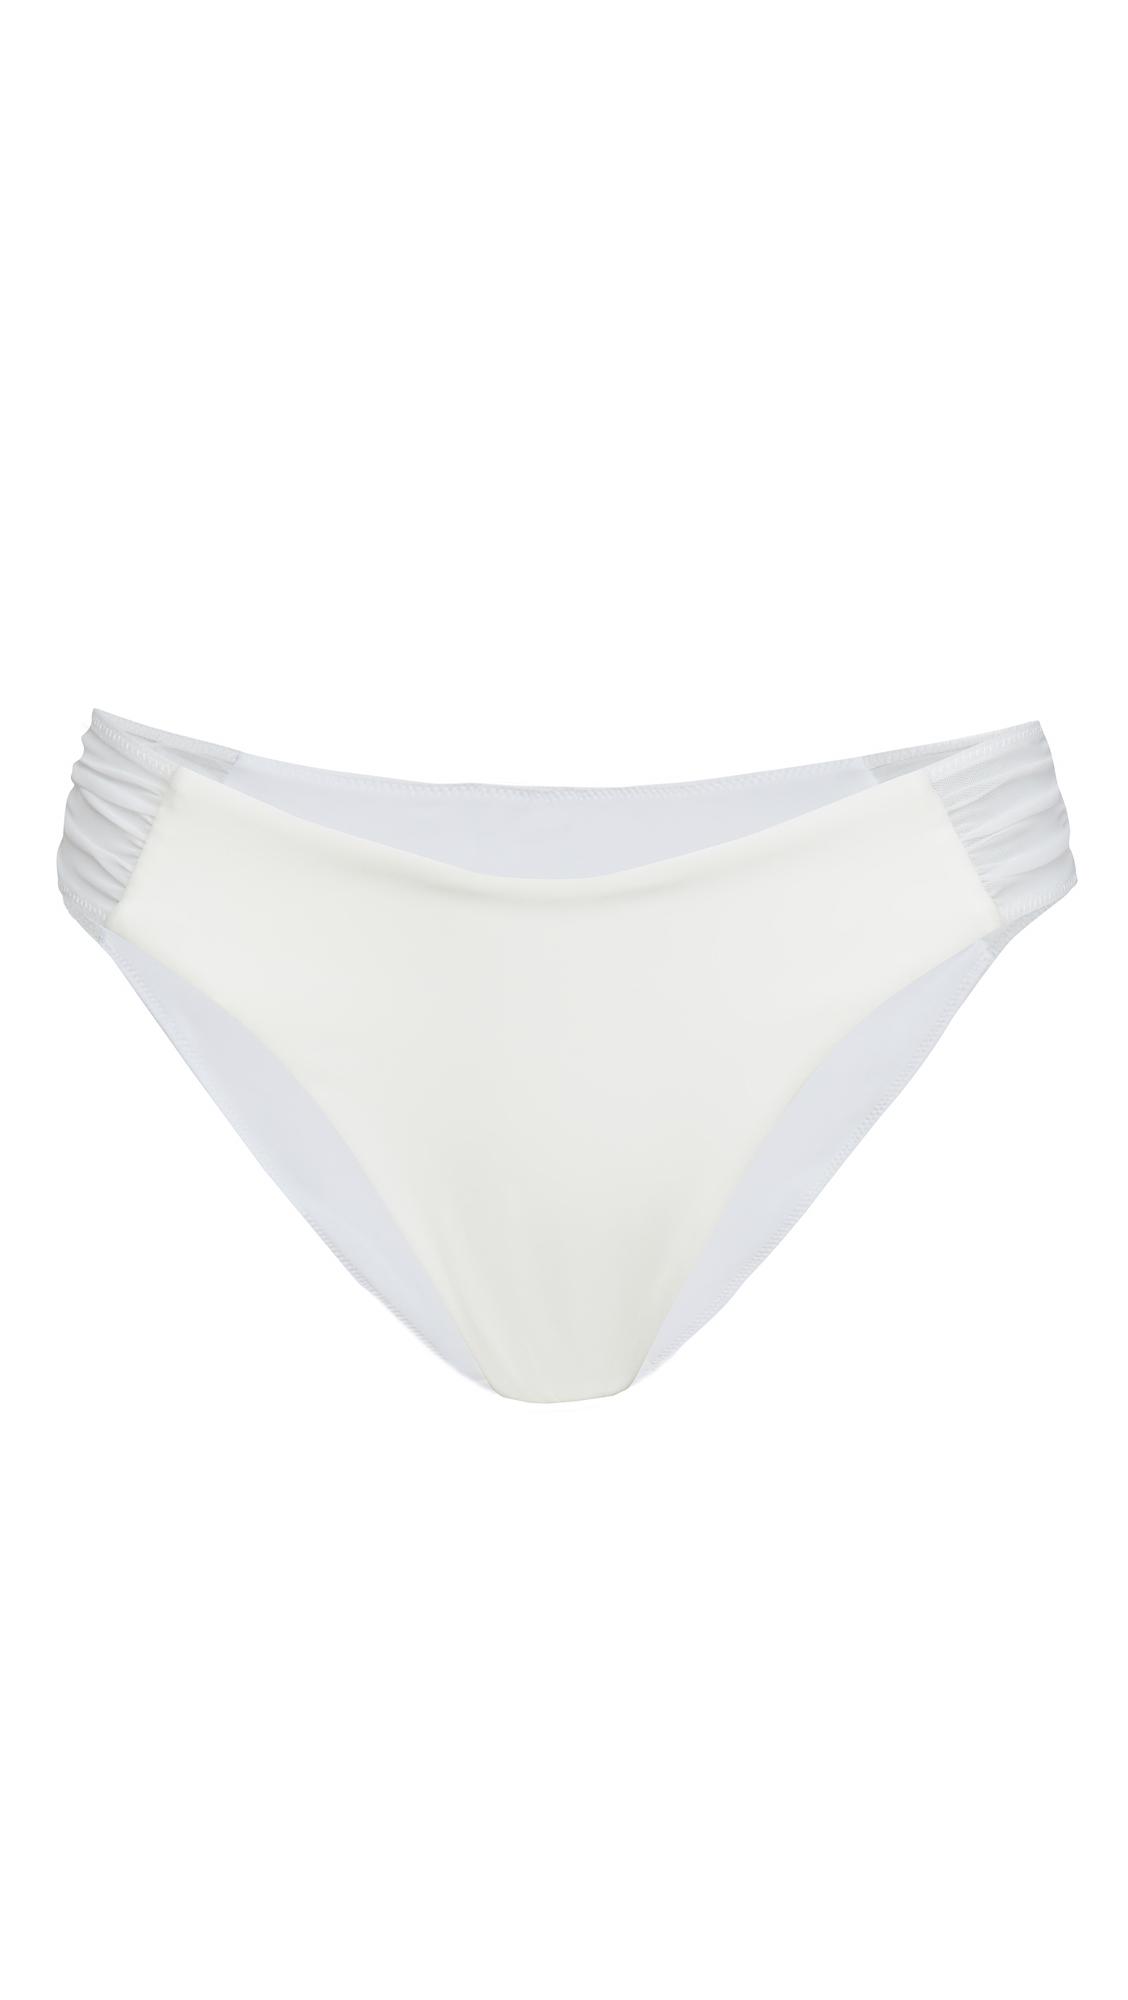 Jonathan Simkhai Camila Sheer Not Sheer Side Ruched Bikini Bottoms